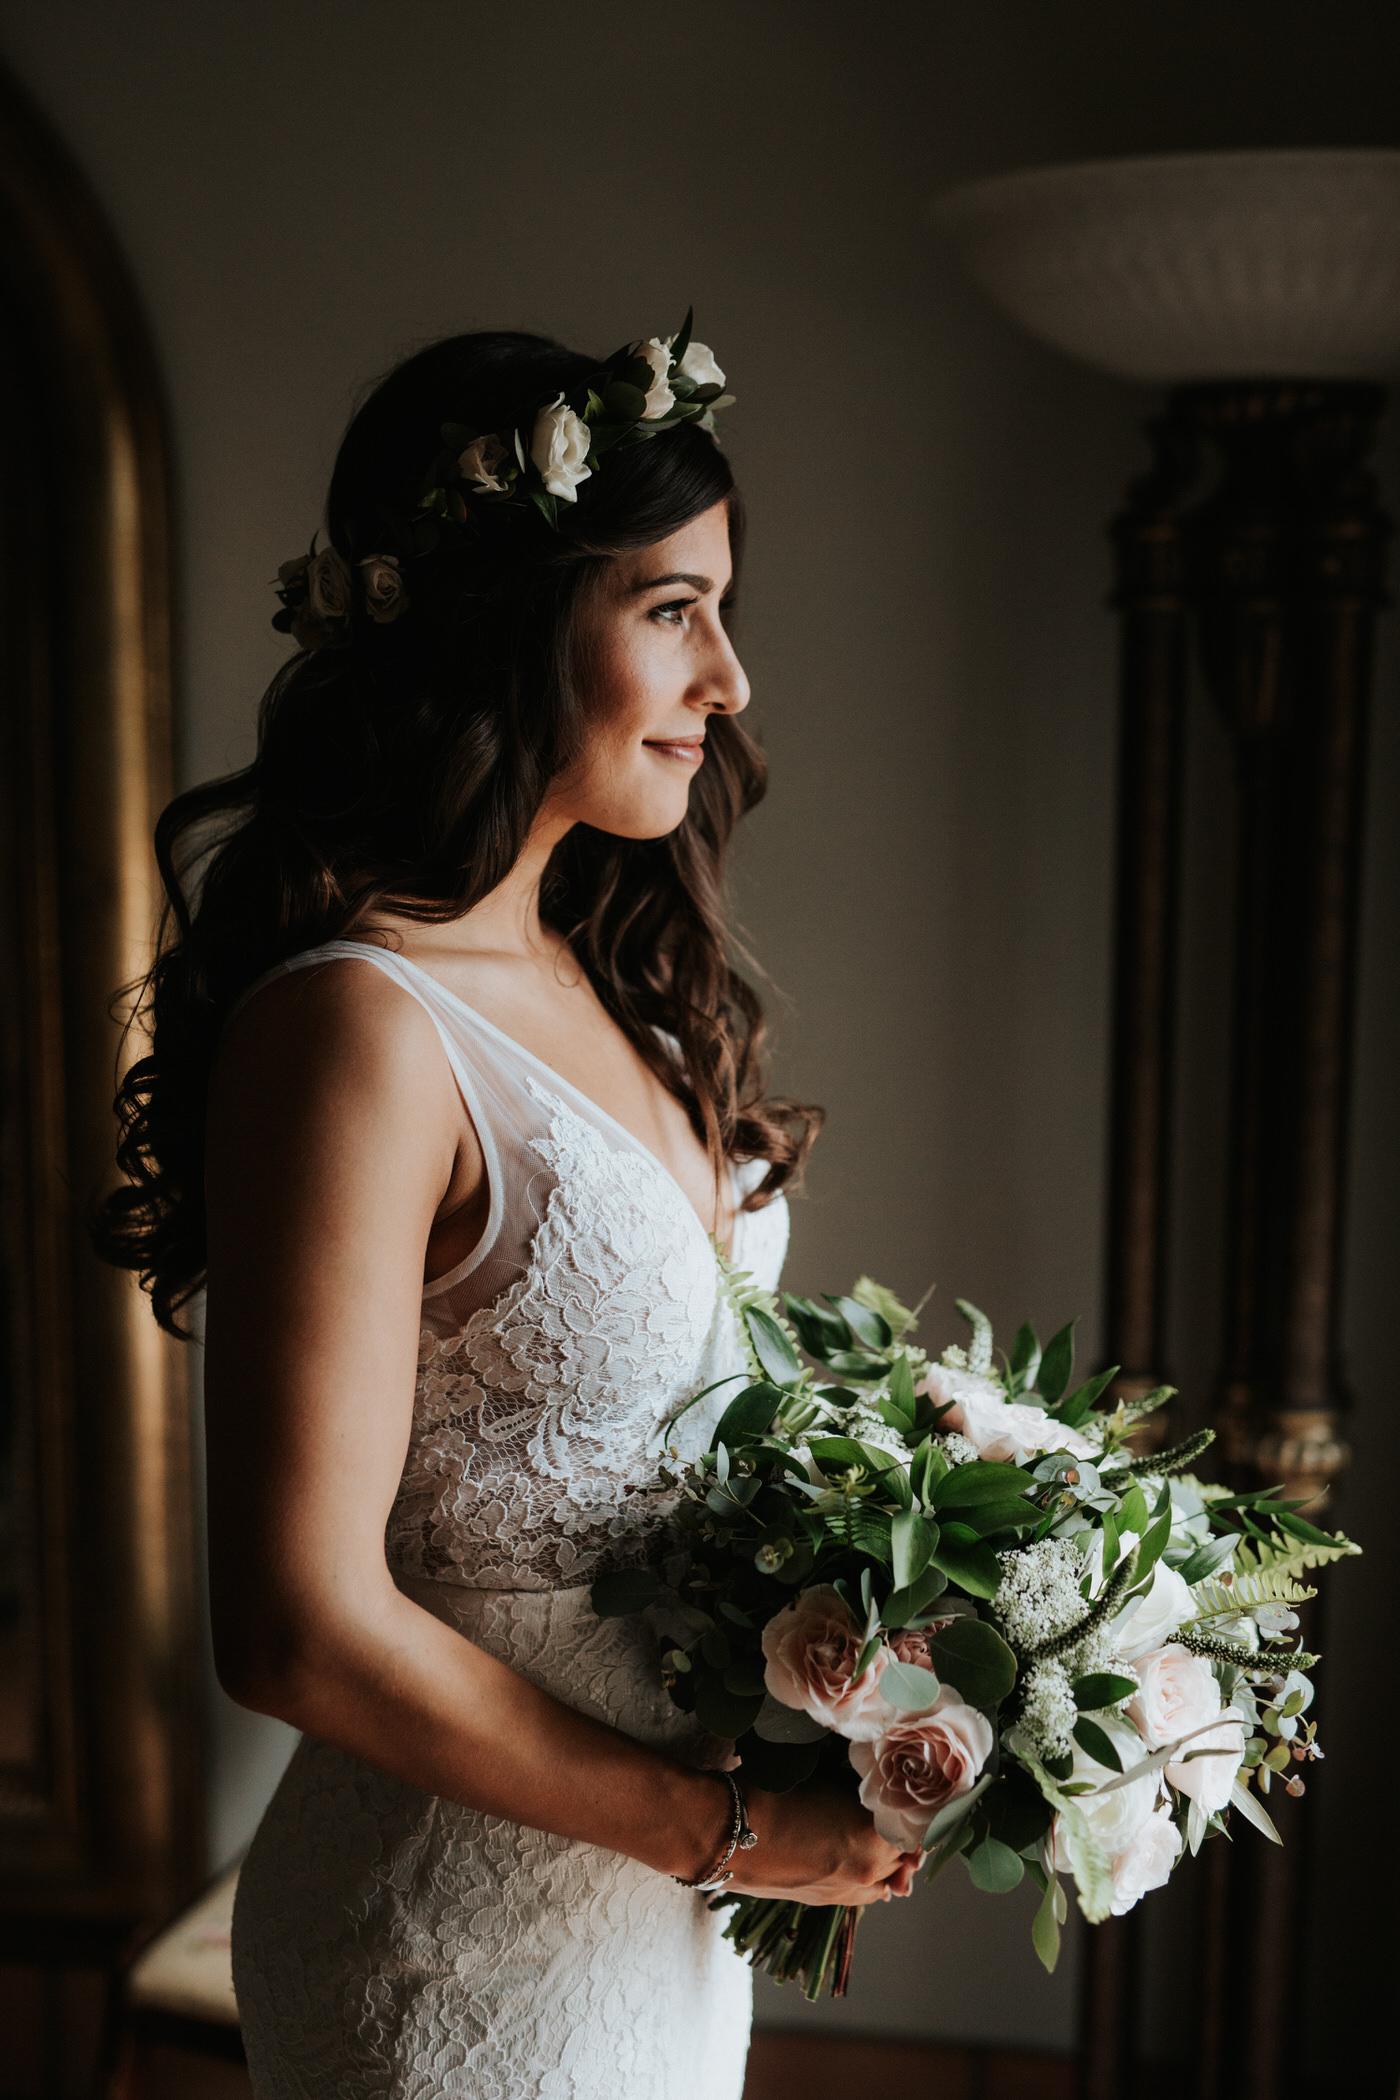 Thurman Mansion Wedding - Diana Ascarrrunz Photography -188.jpg